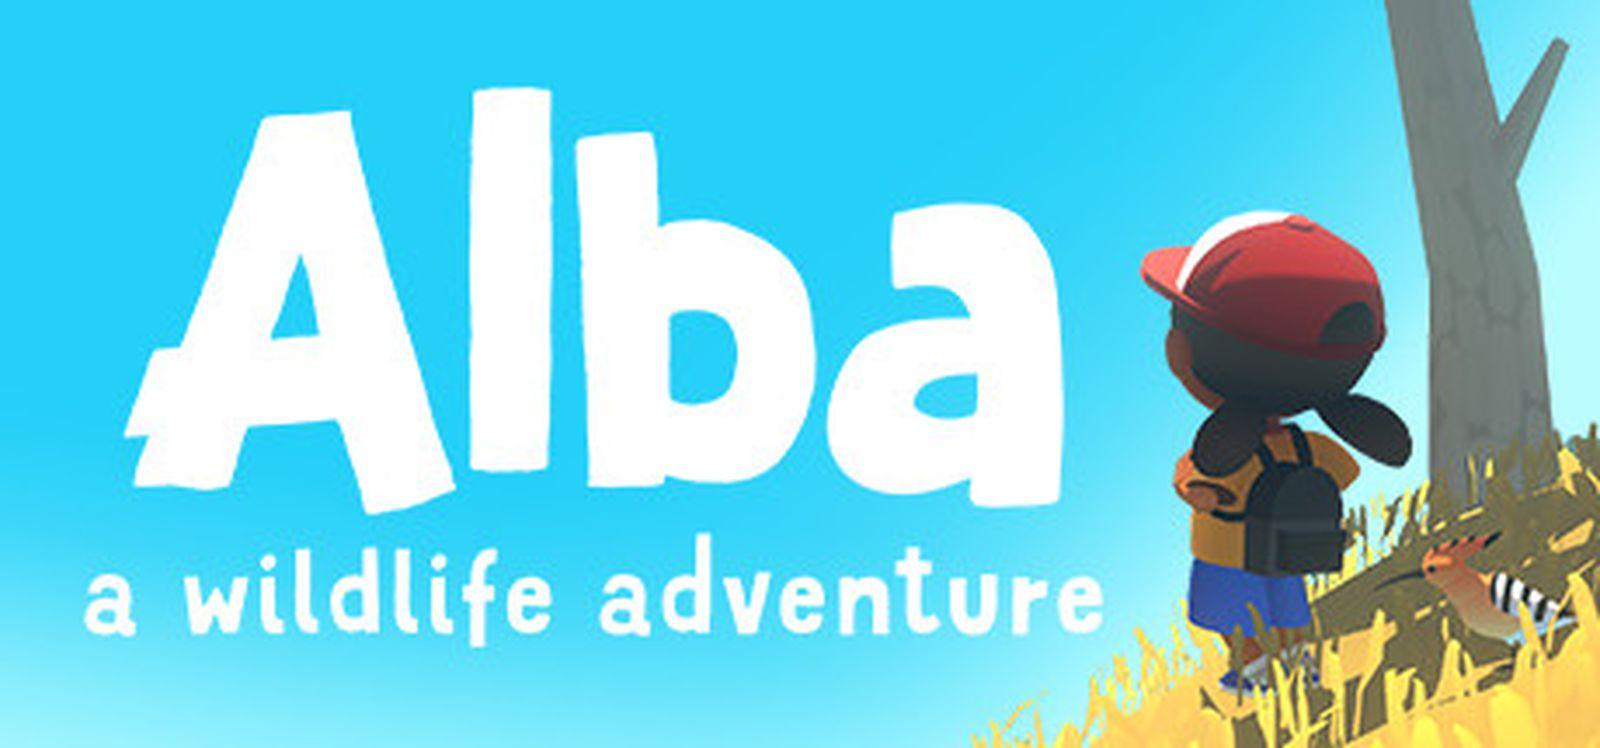 Monument Valley Developers Release 'Alba: a Wildlife Adventure' on Apple Arcade